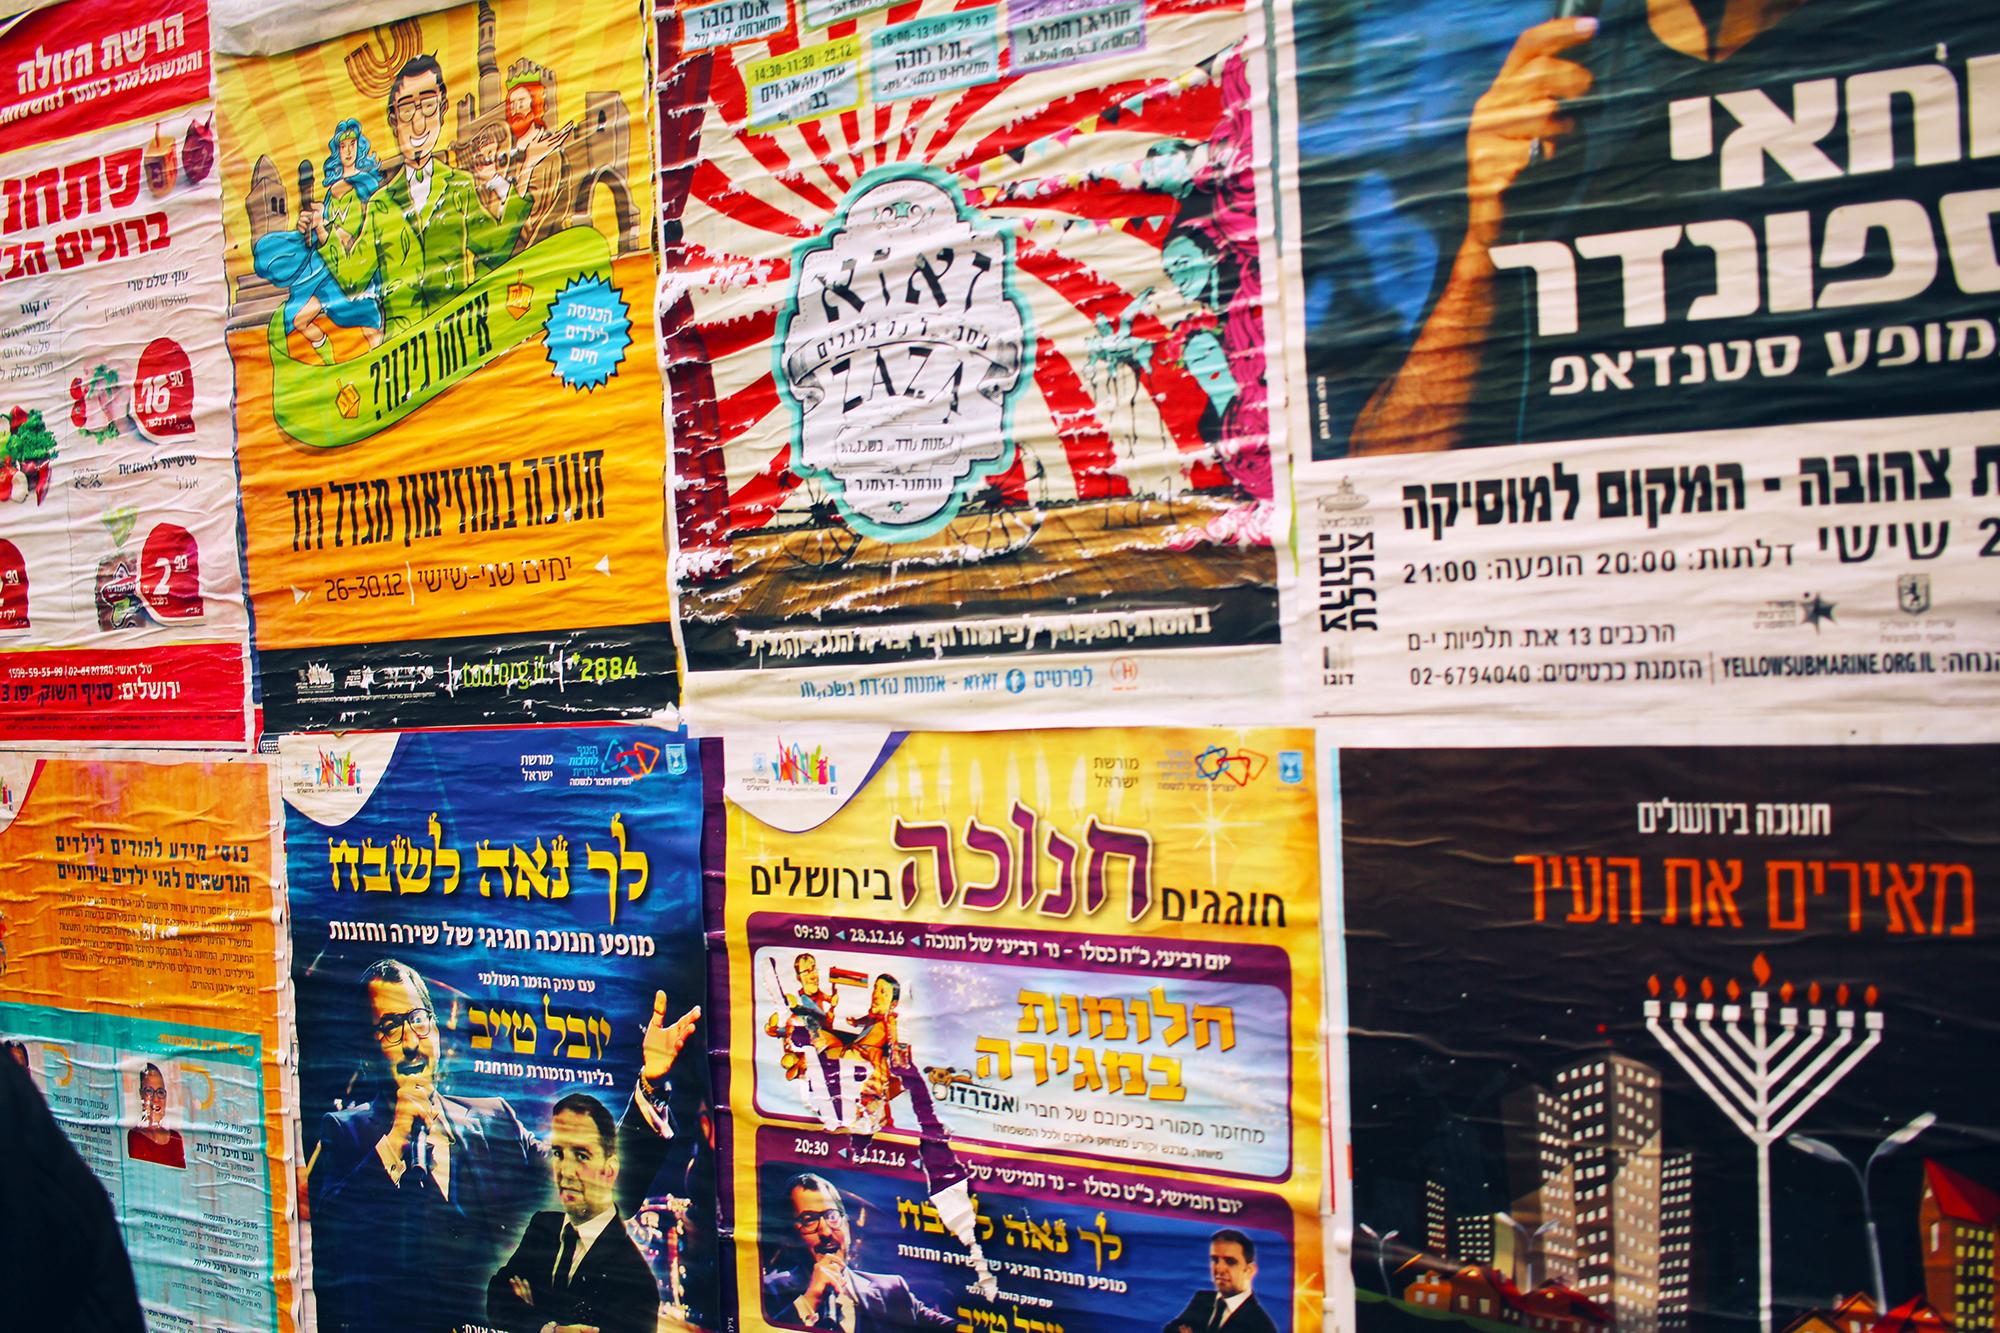 Shuk Machane Yehuda, Jerusalem, Israel. Travel photography by Geena Matuson @geenamatuson #thegirlmirage.